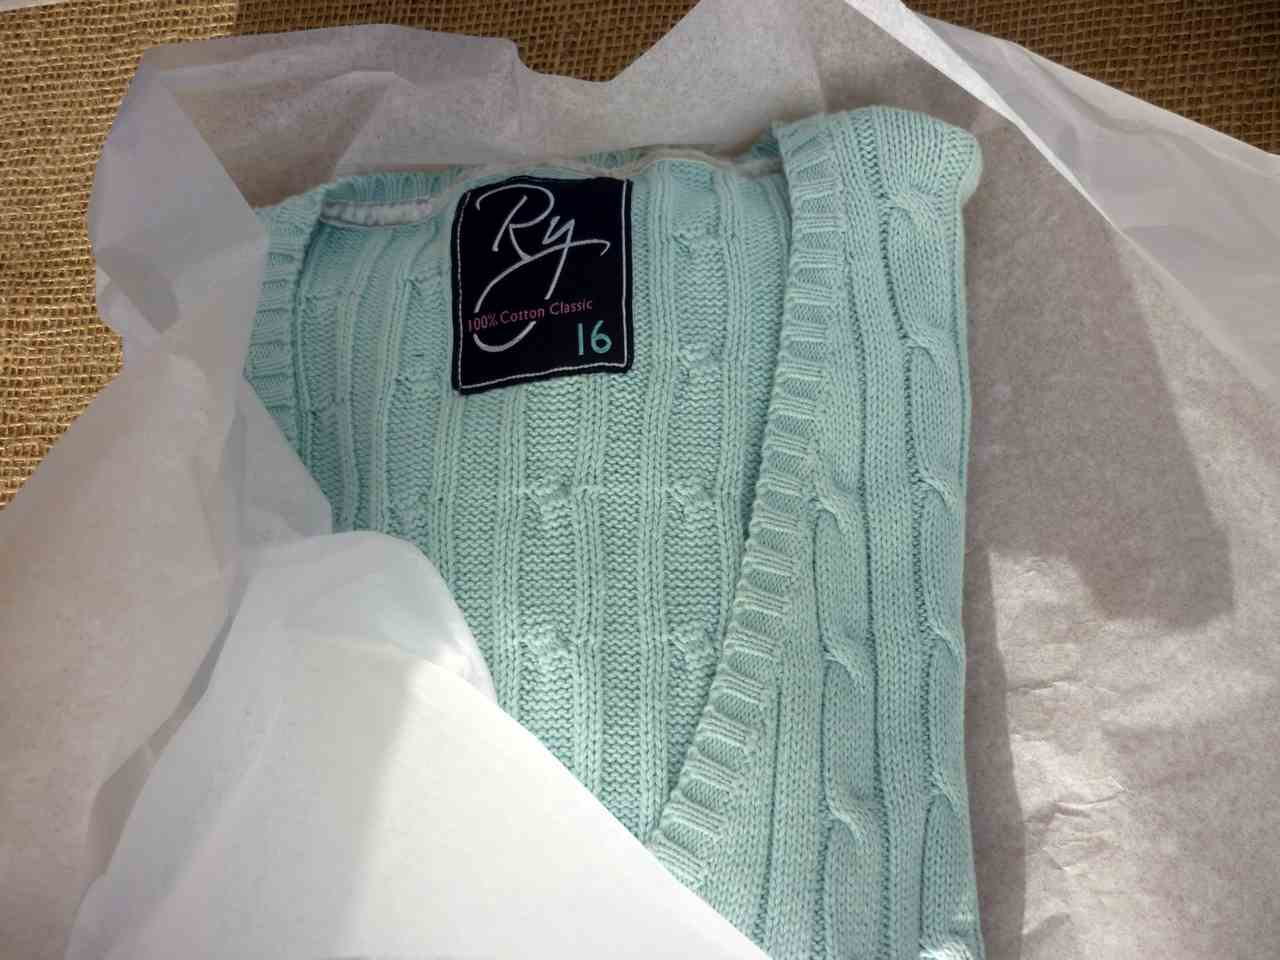 Vintage-Patch.co.uk Rydale jumper packing